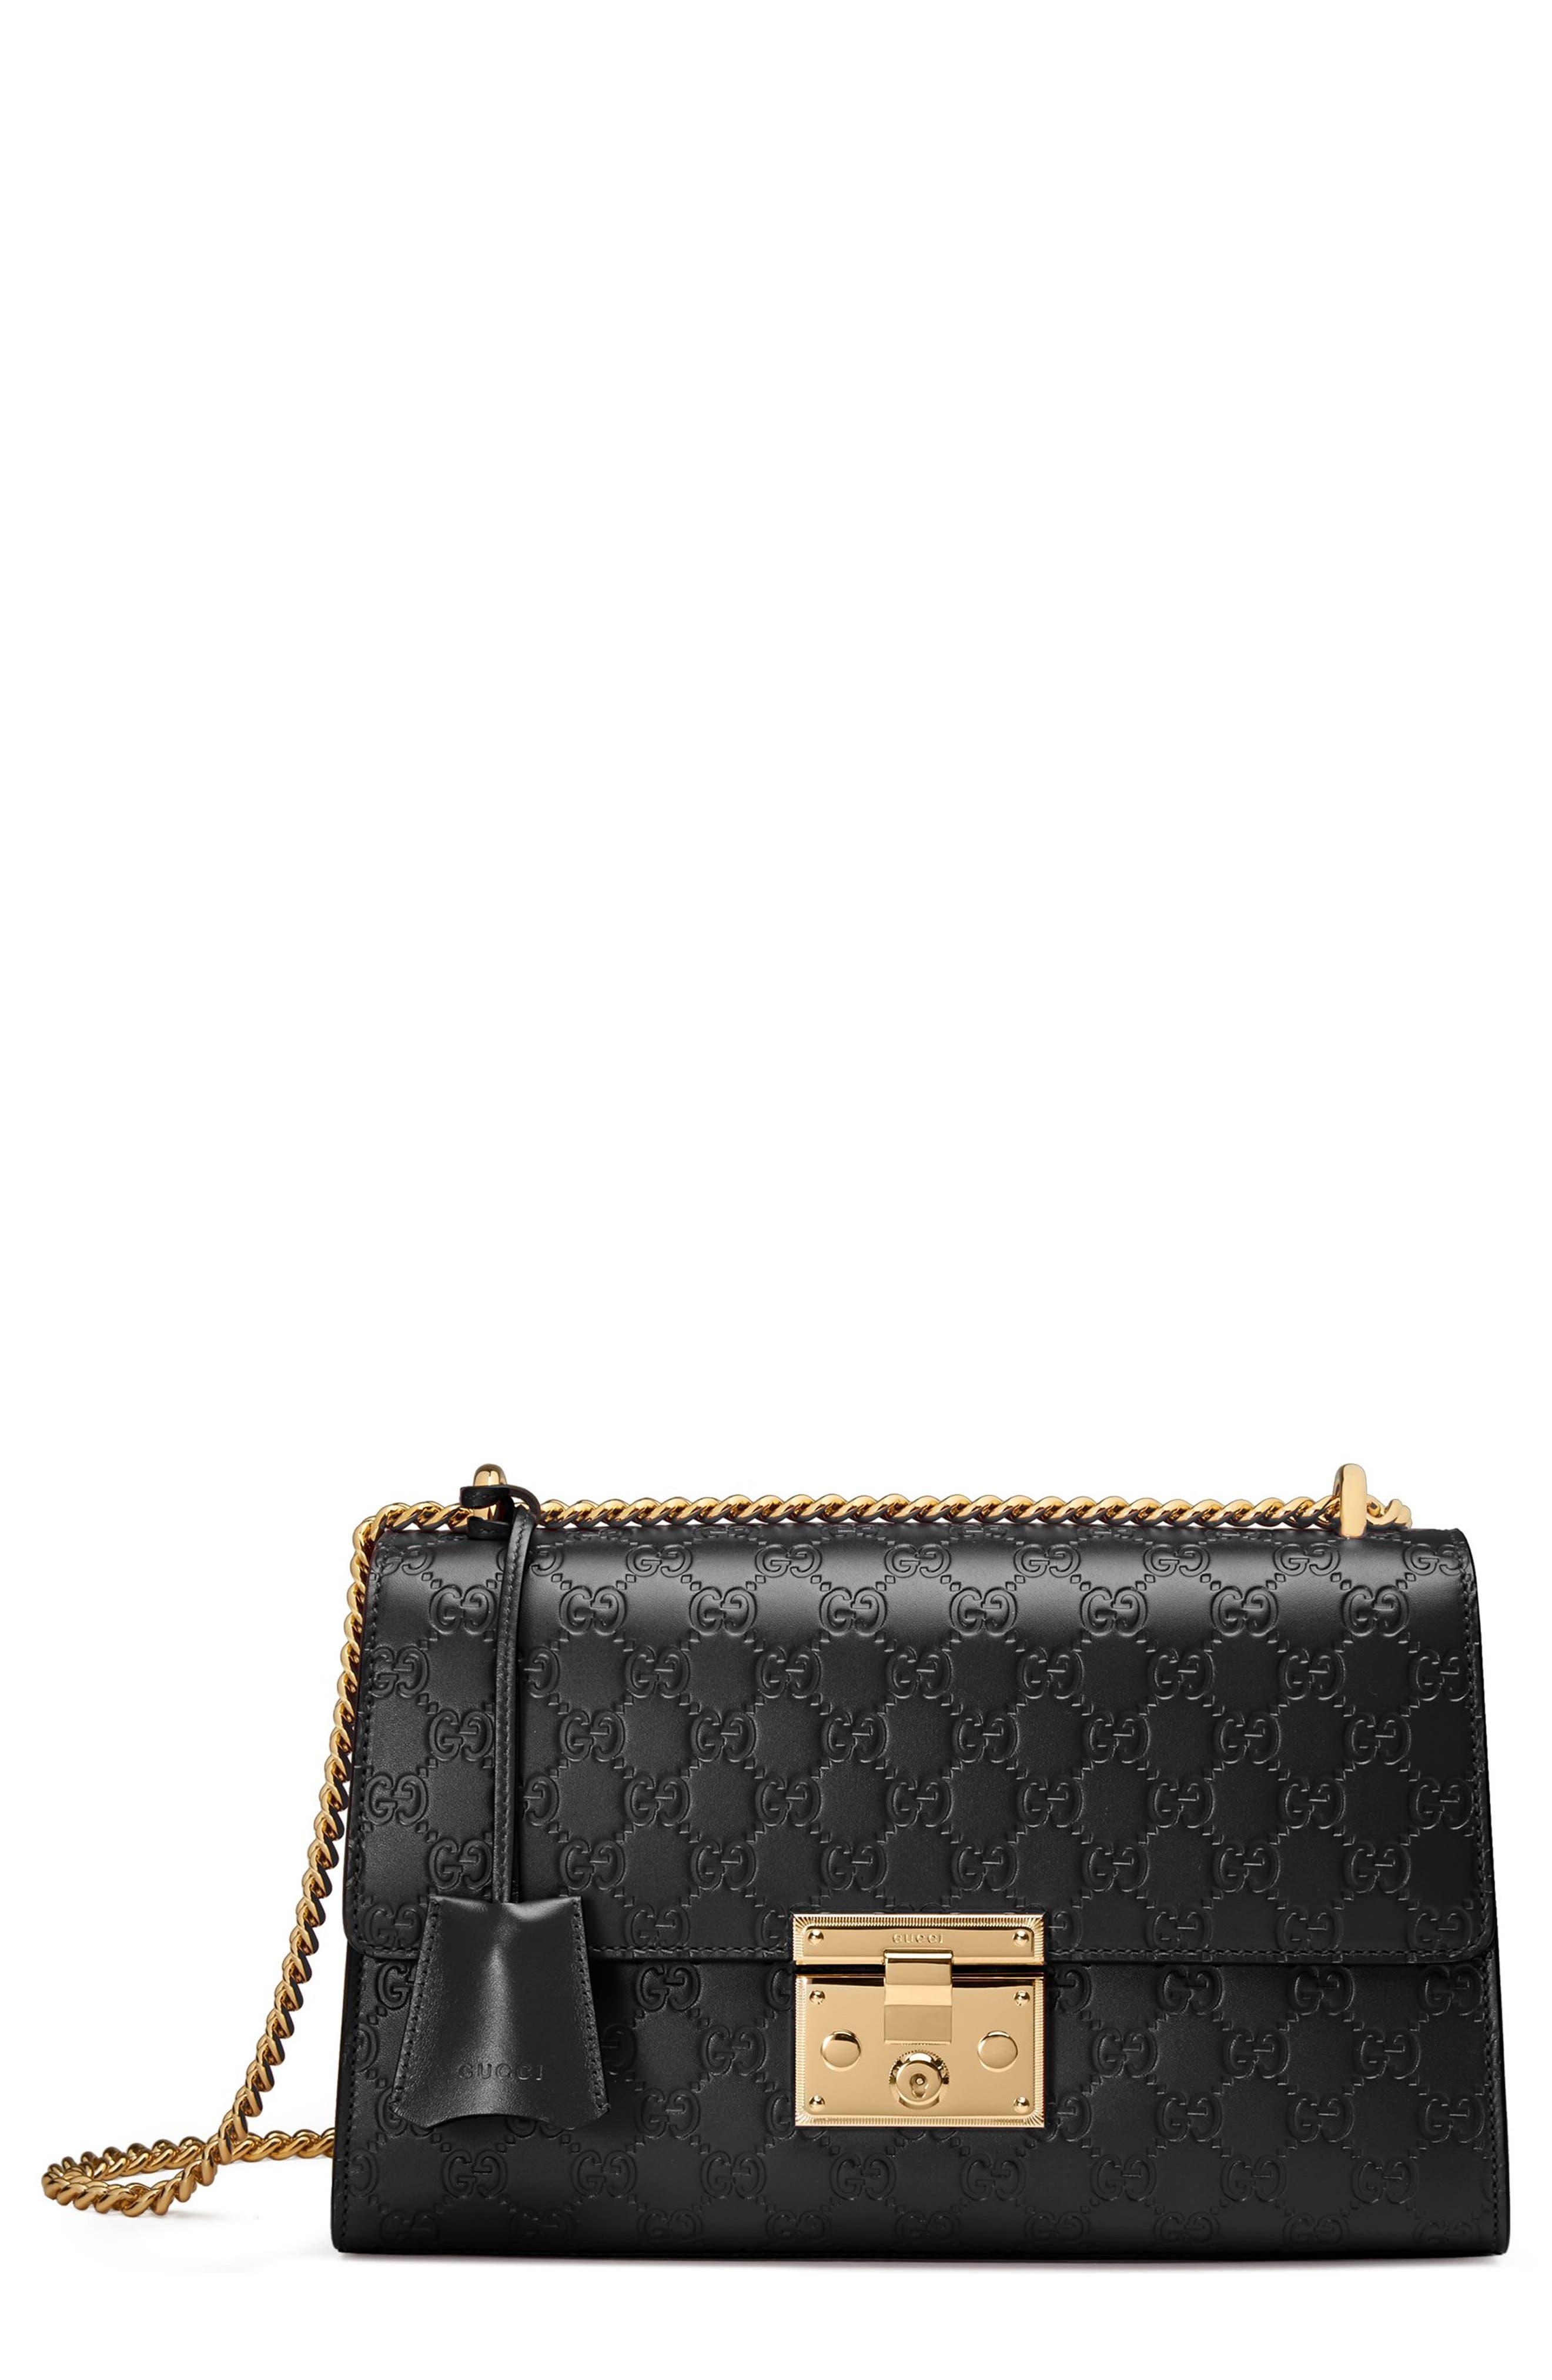 Medium Padlock Signature Leather Shoulder Bag, Main, color, NERO